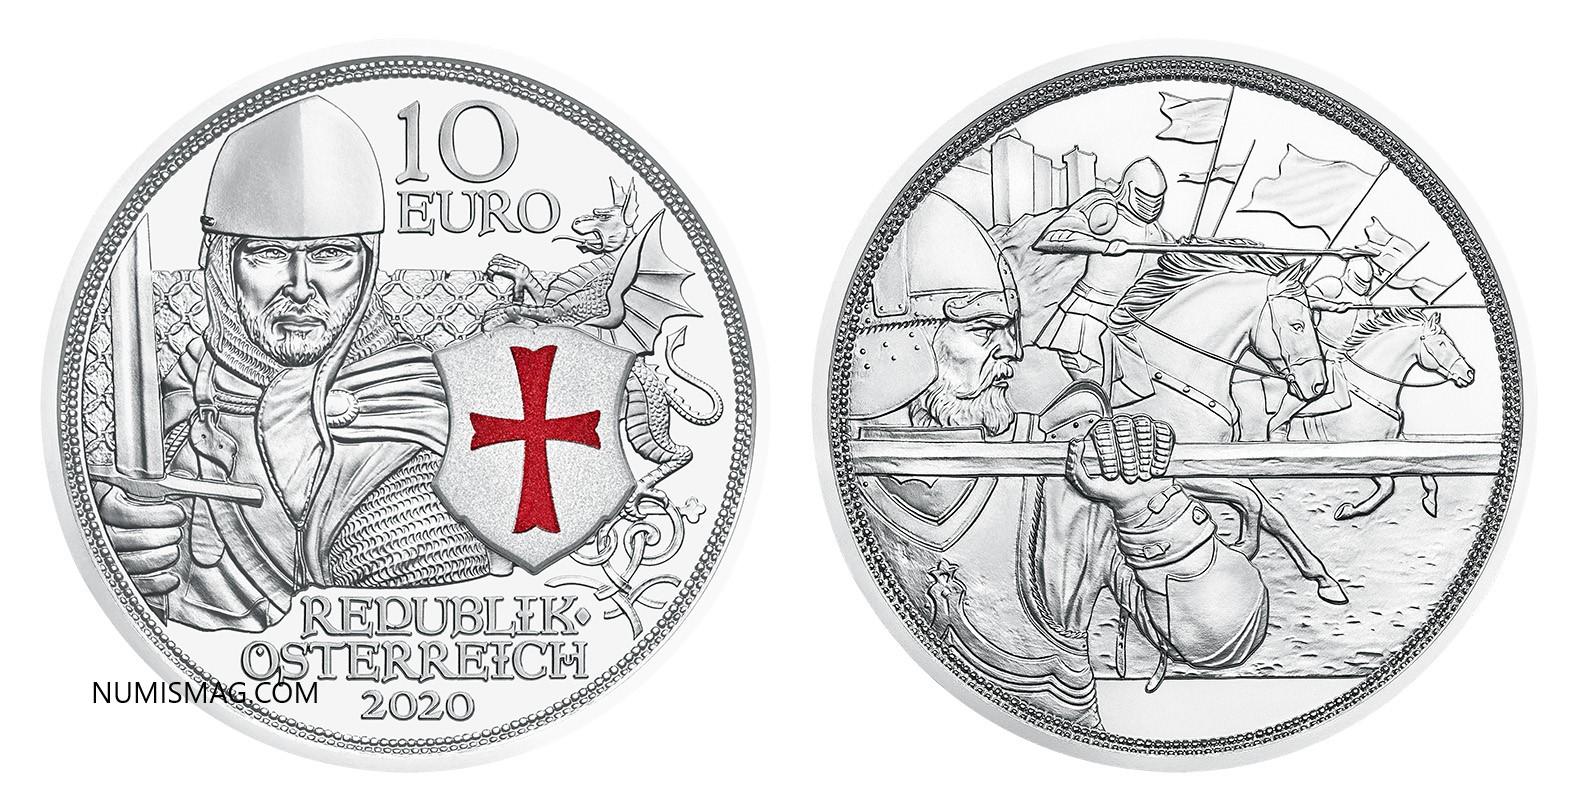 2020 Austrian Knights' Tales €10 coin